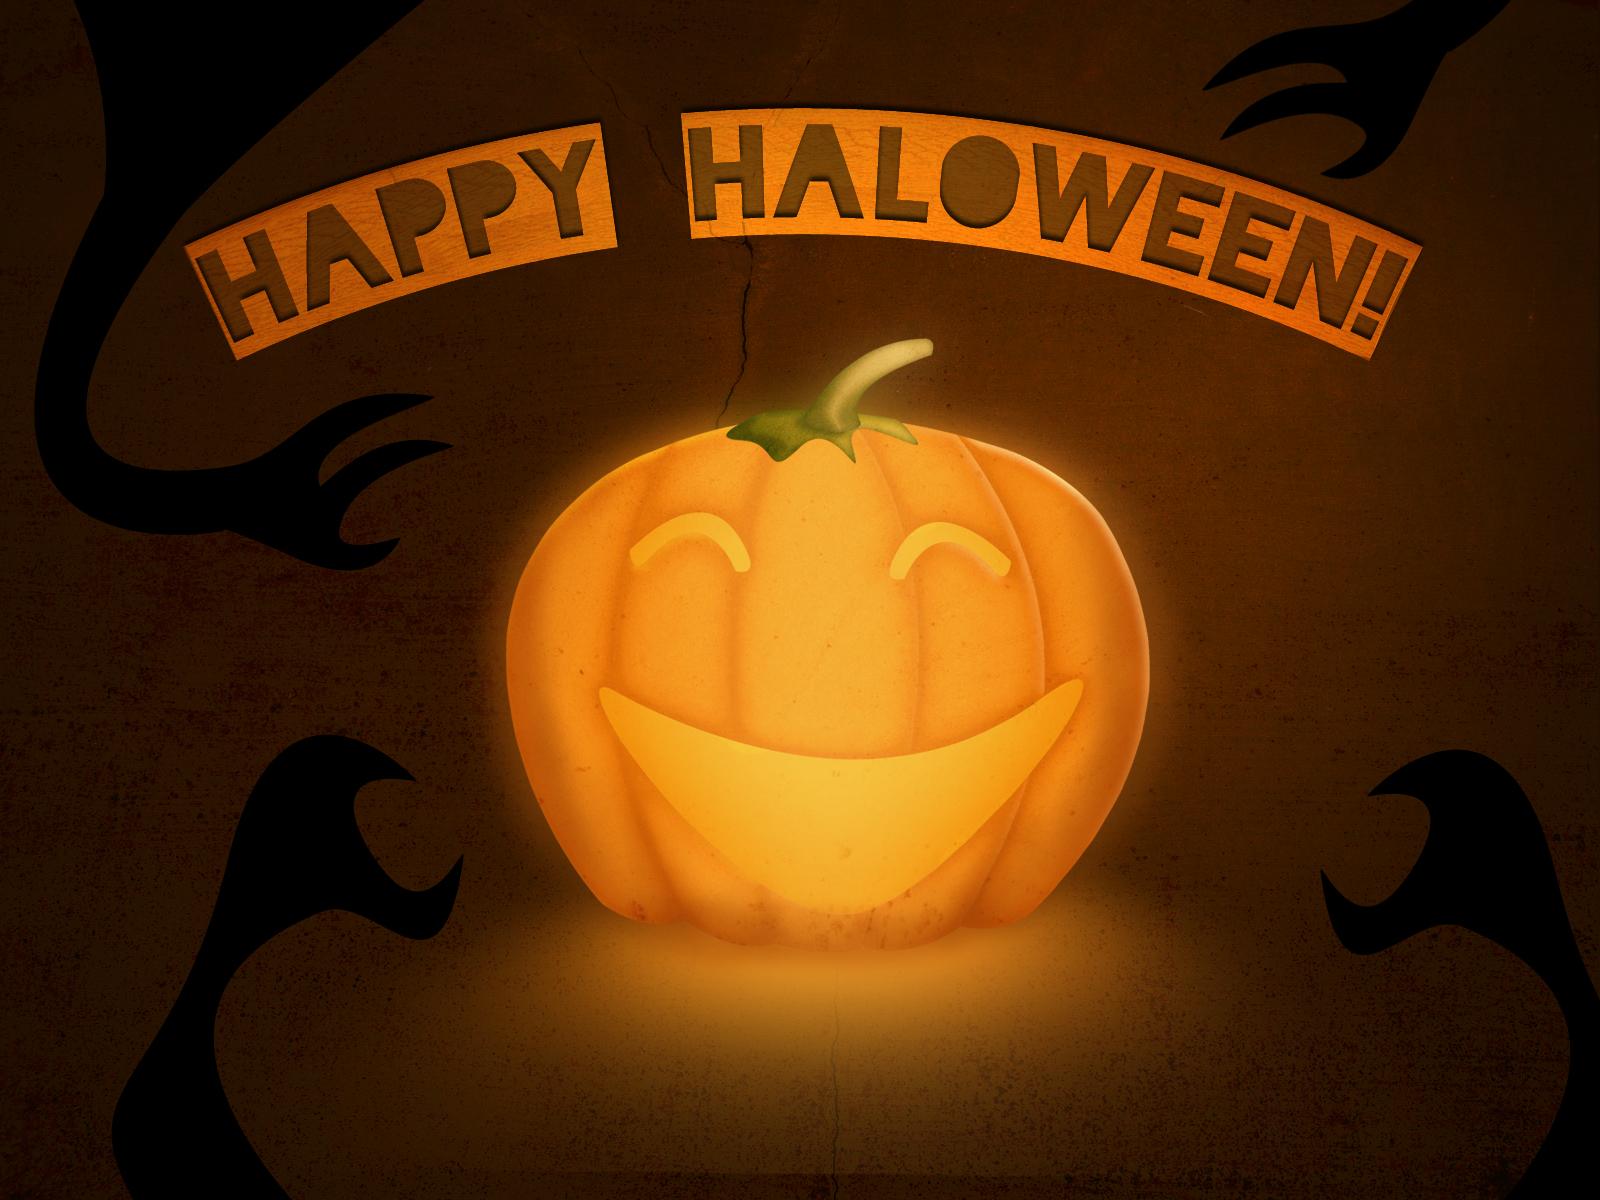 cute happy halloween wallpaper cute happy halloween wallpaper cute 1600x1200